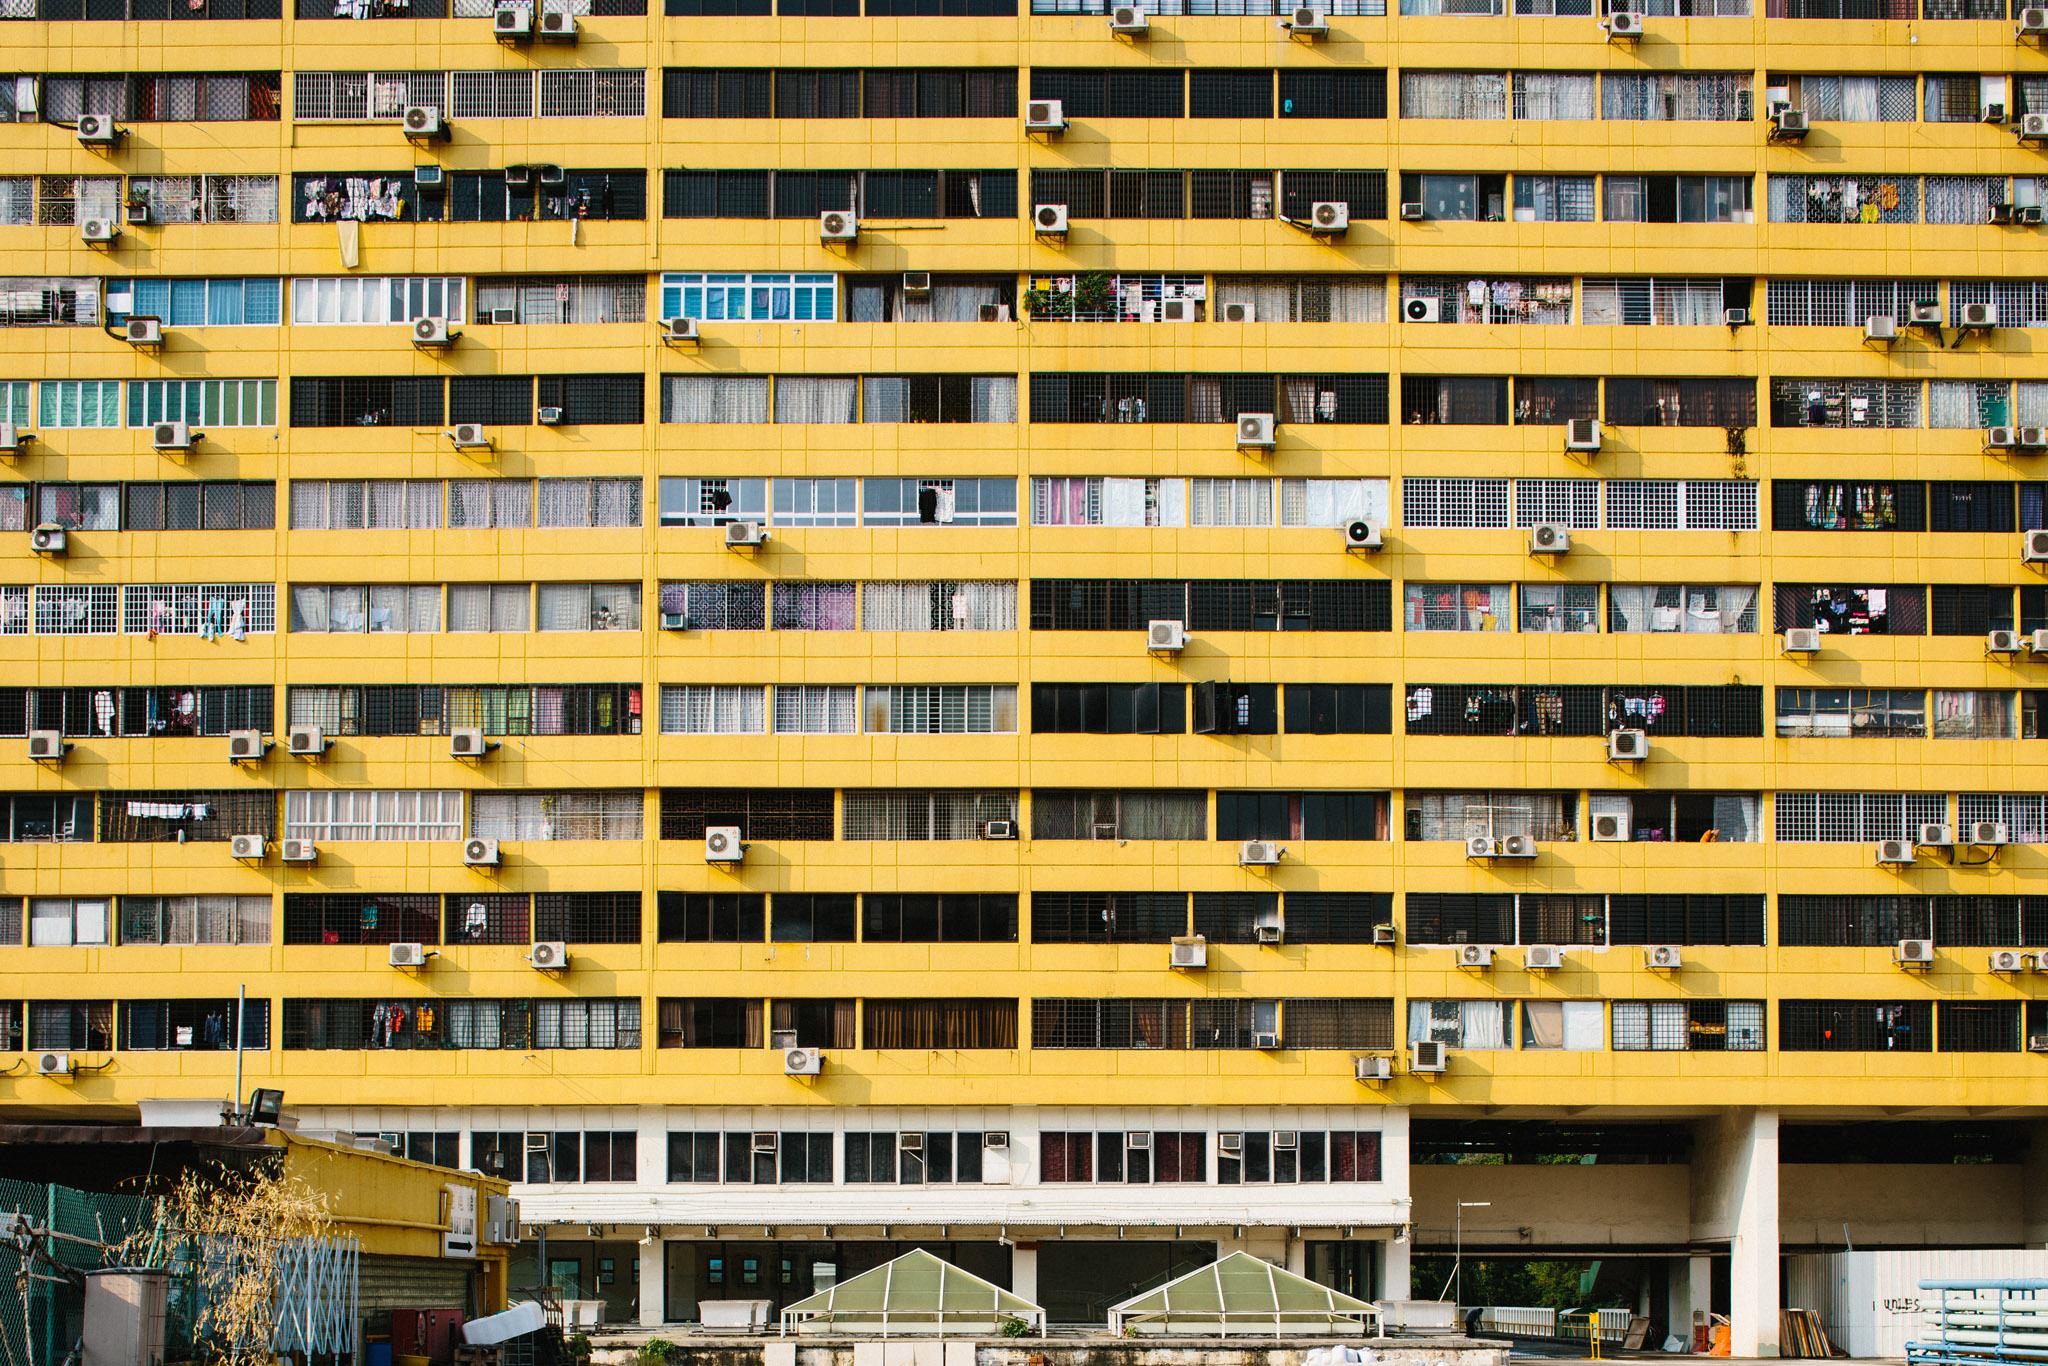 singapore-commercial-editorial-photographer-le-nouvel-obseveteur-singapore-creative-zakaria-zainal-31.jpg